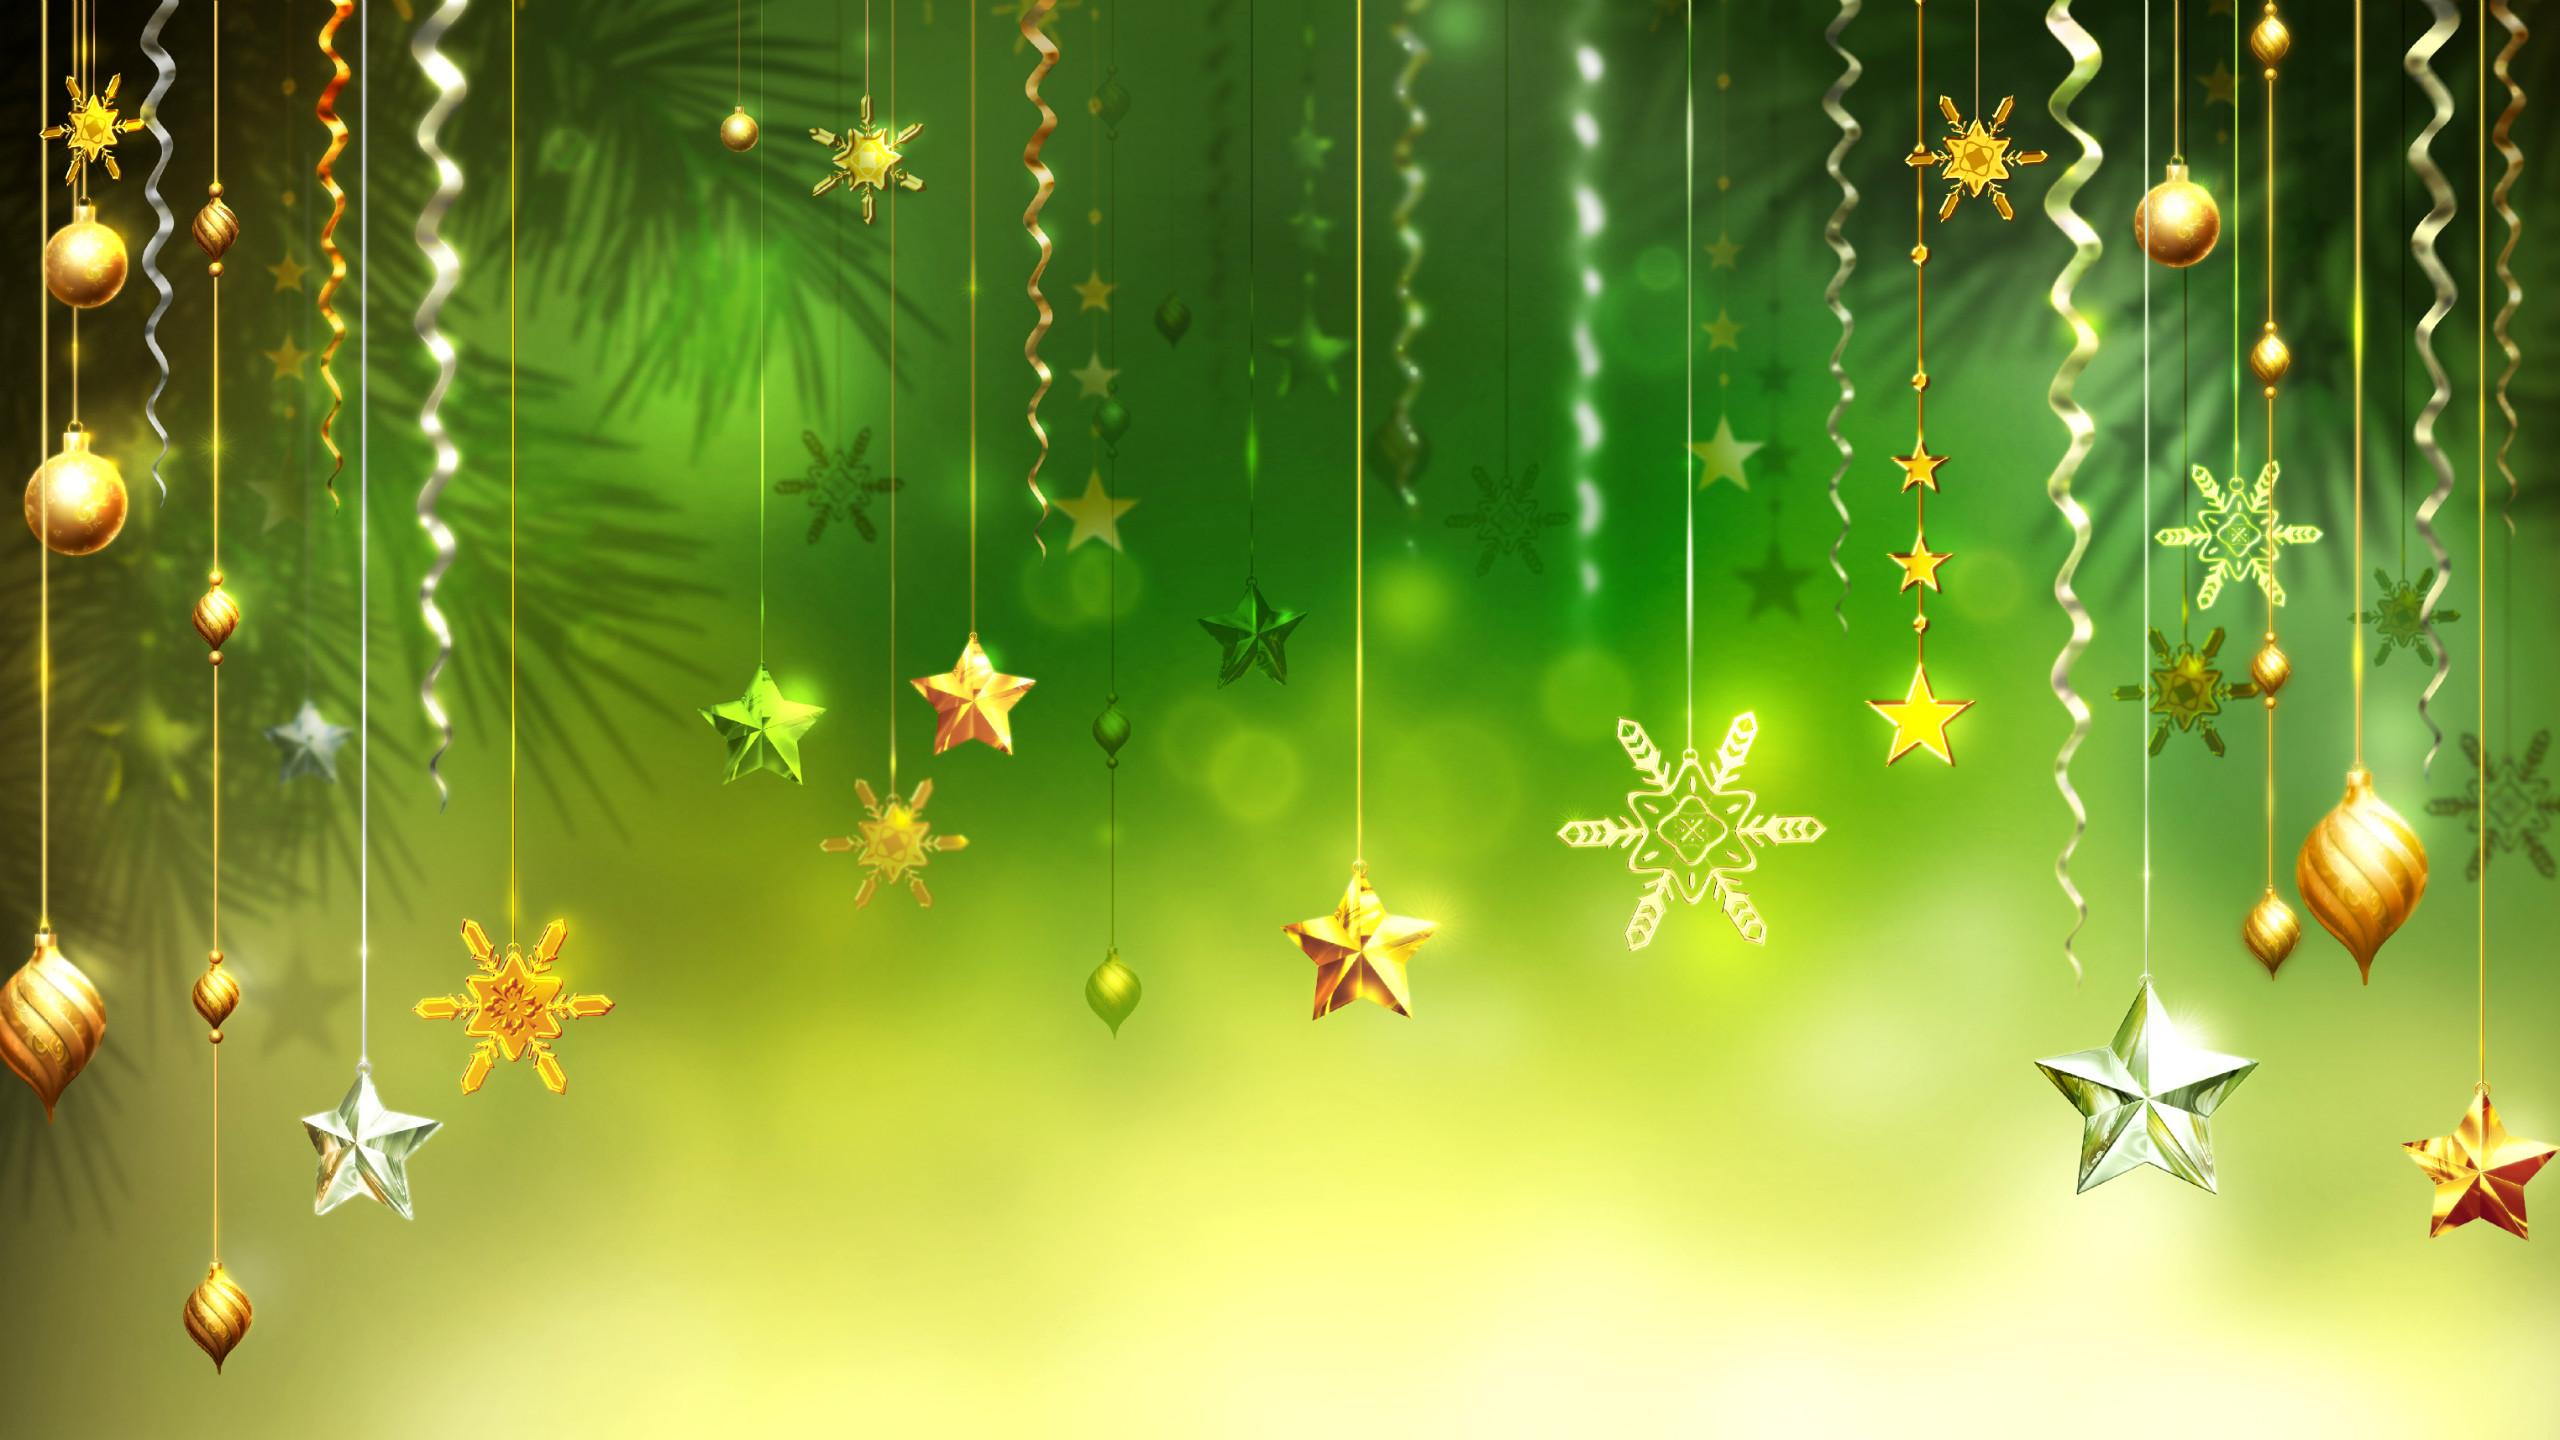 Christmas Wallpaper HD Green